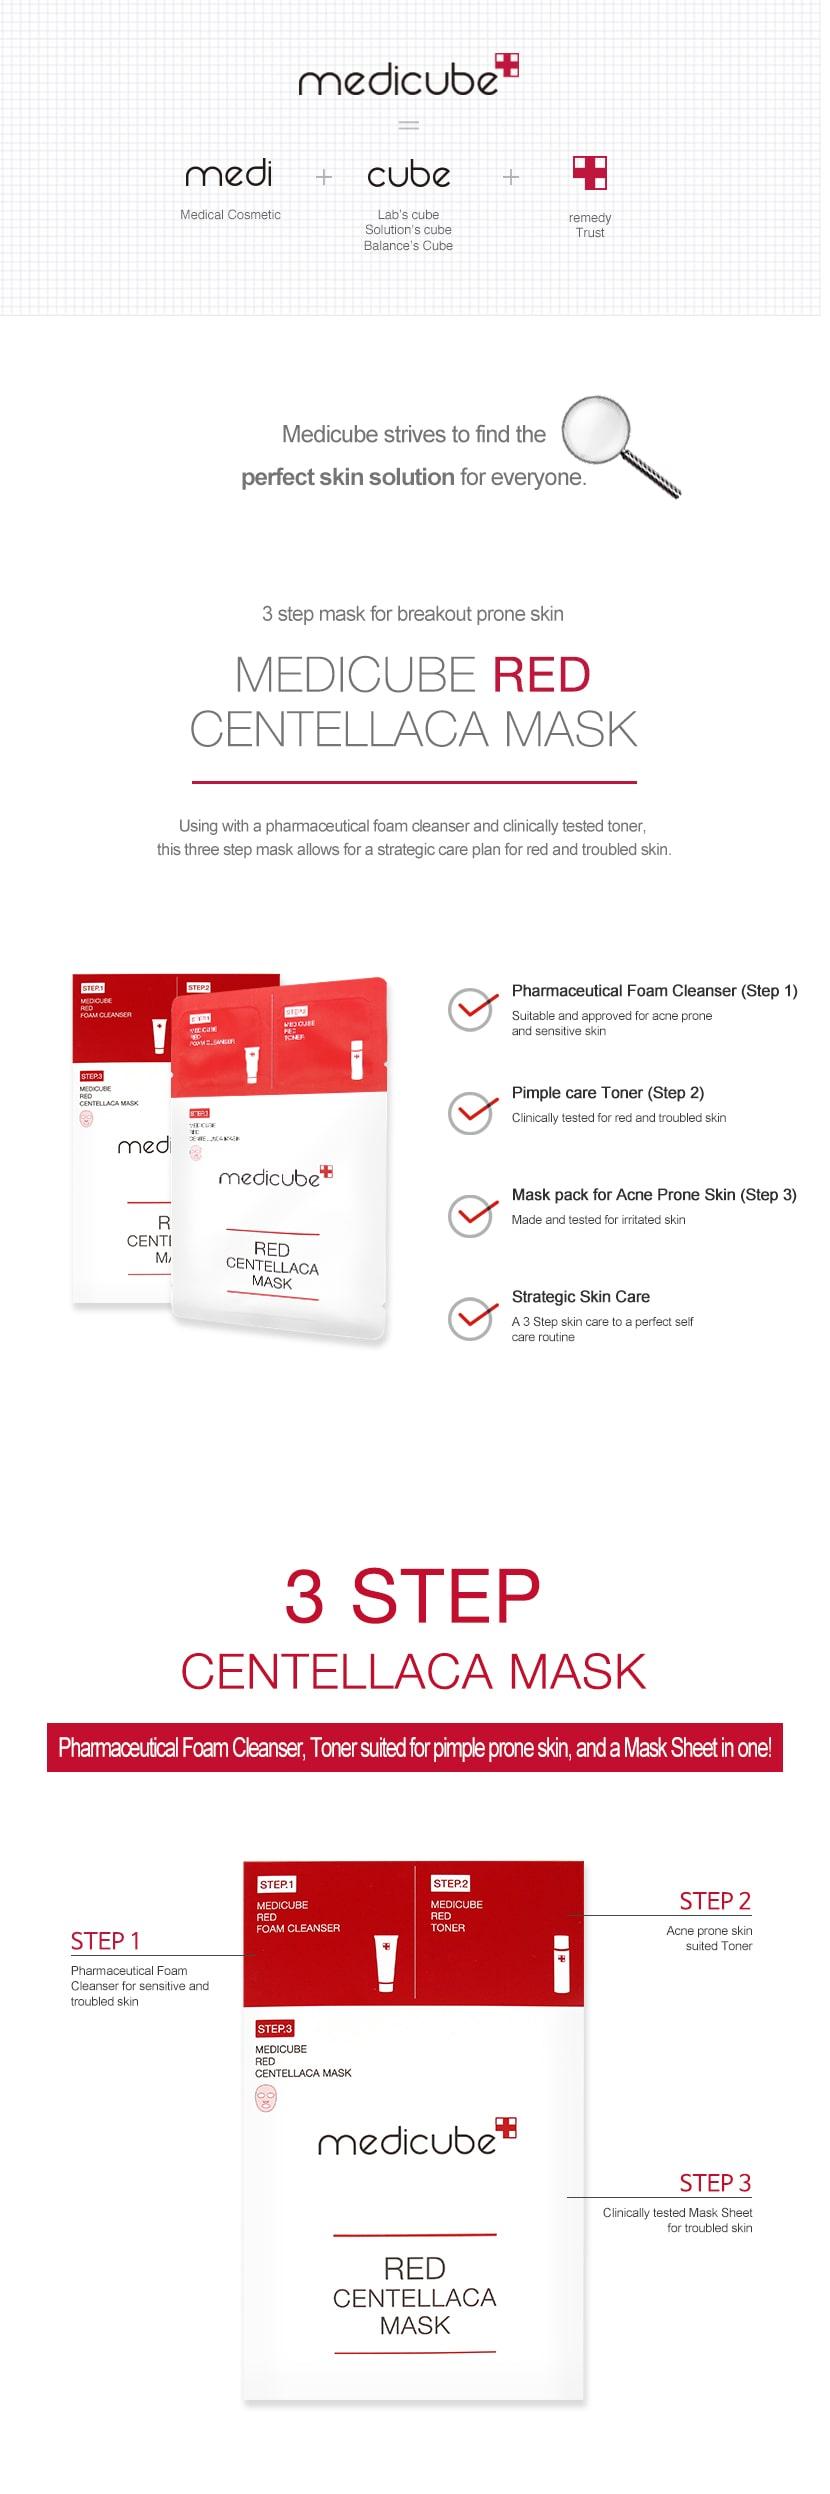 Red Centellaca Mask - Intro